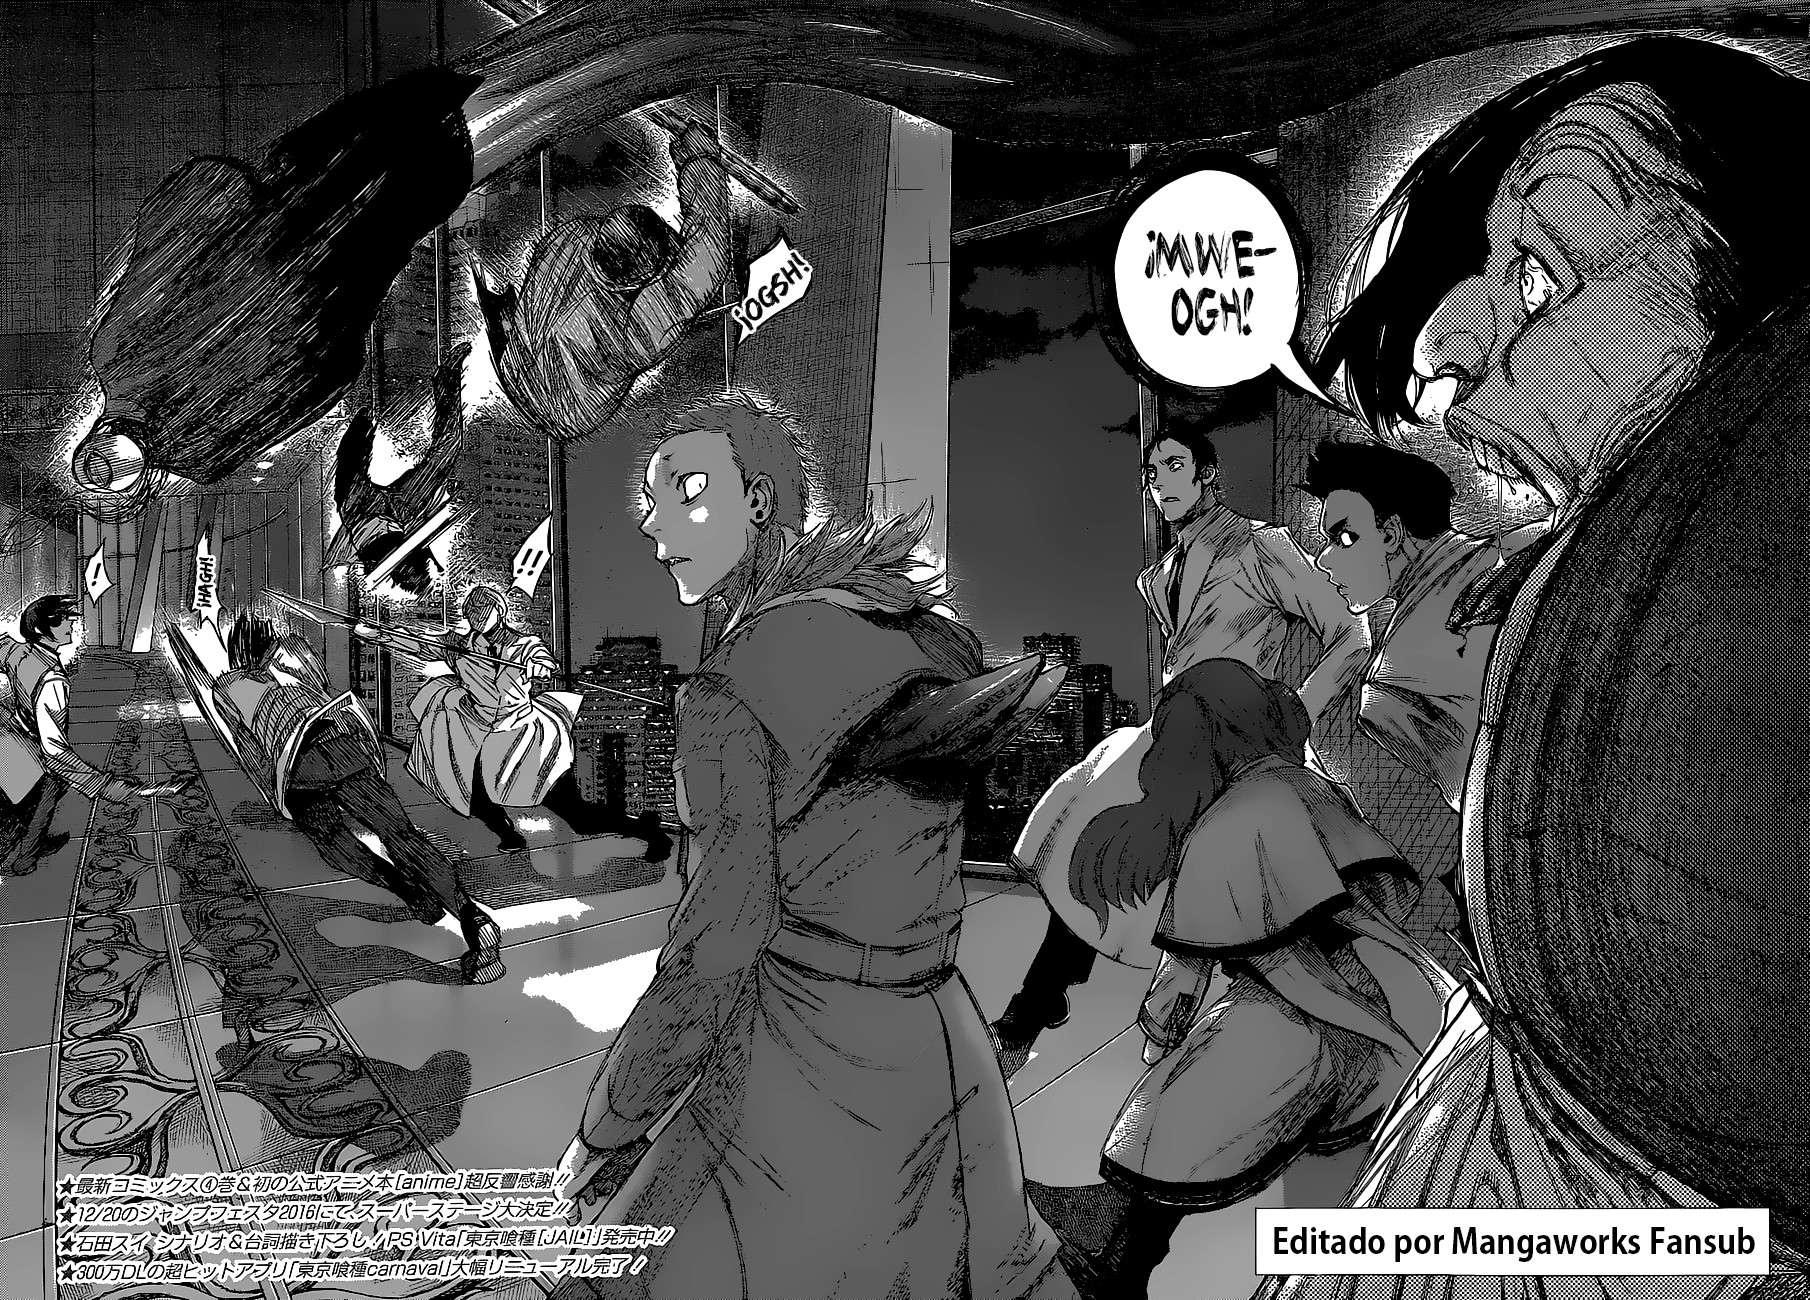 http://c5.ninemanga.com/es_manga/59/59/420024/80fd4c6a571eafc1f1663d245068e188.jpg Page 4